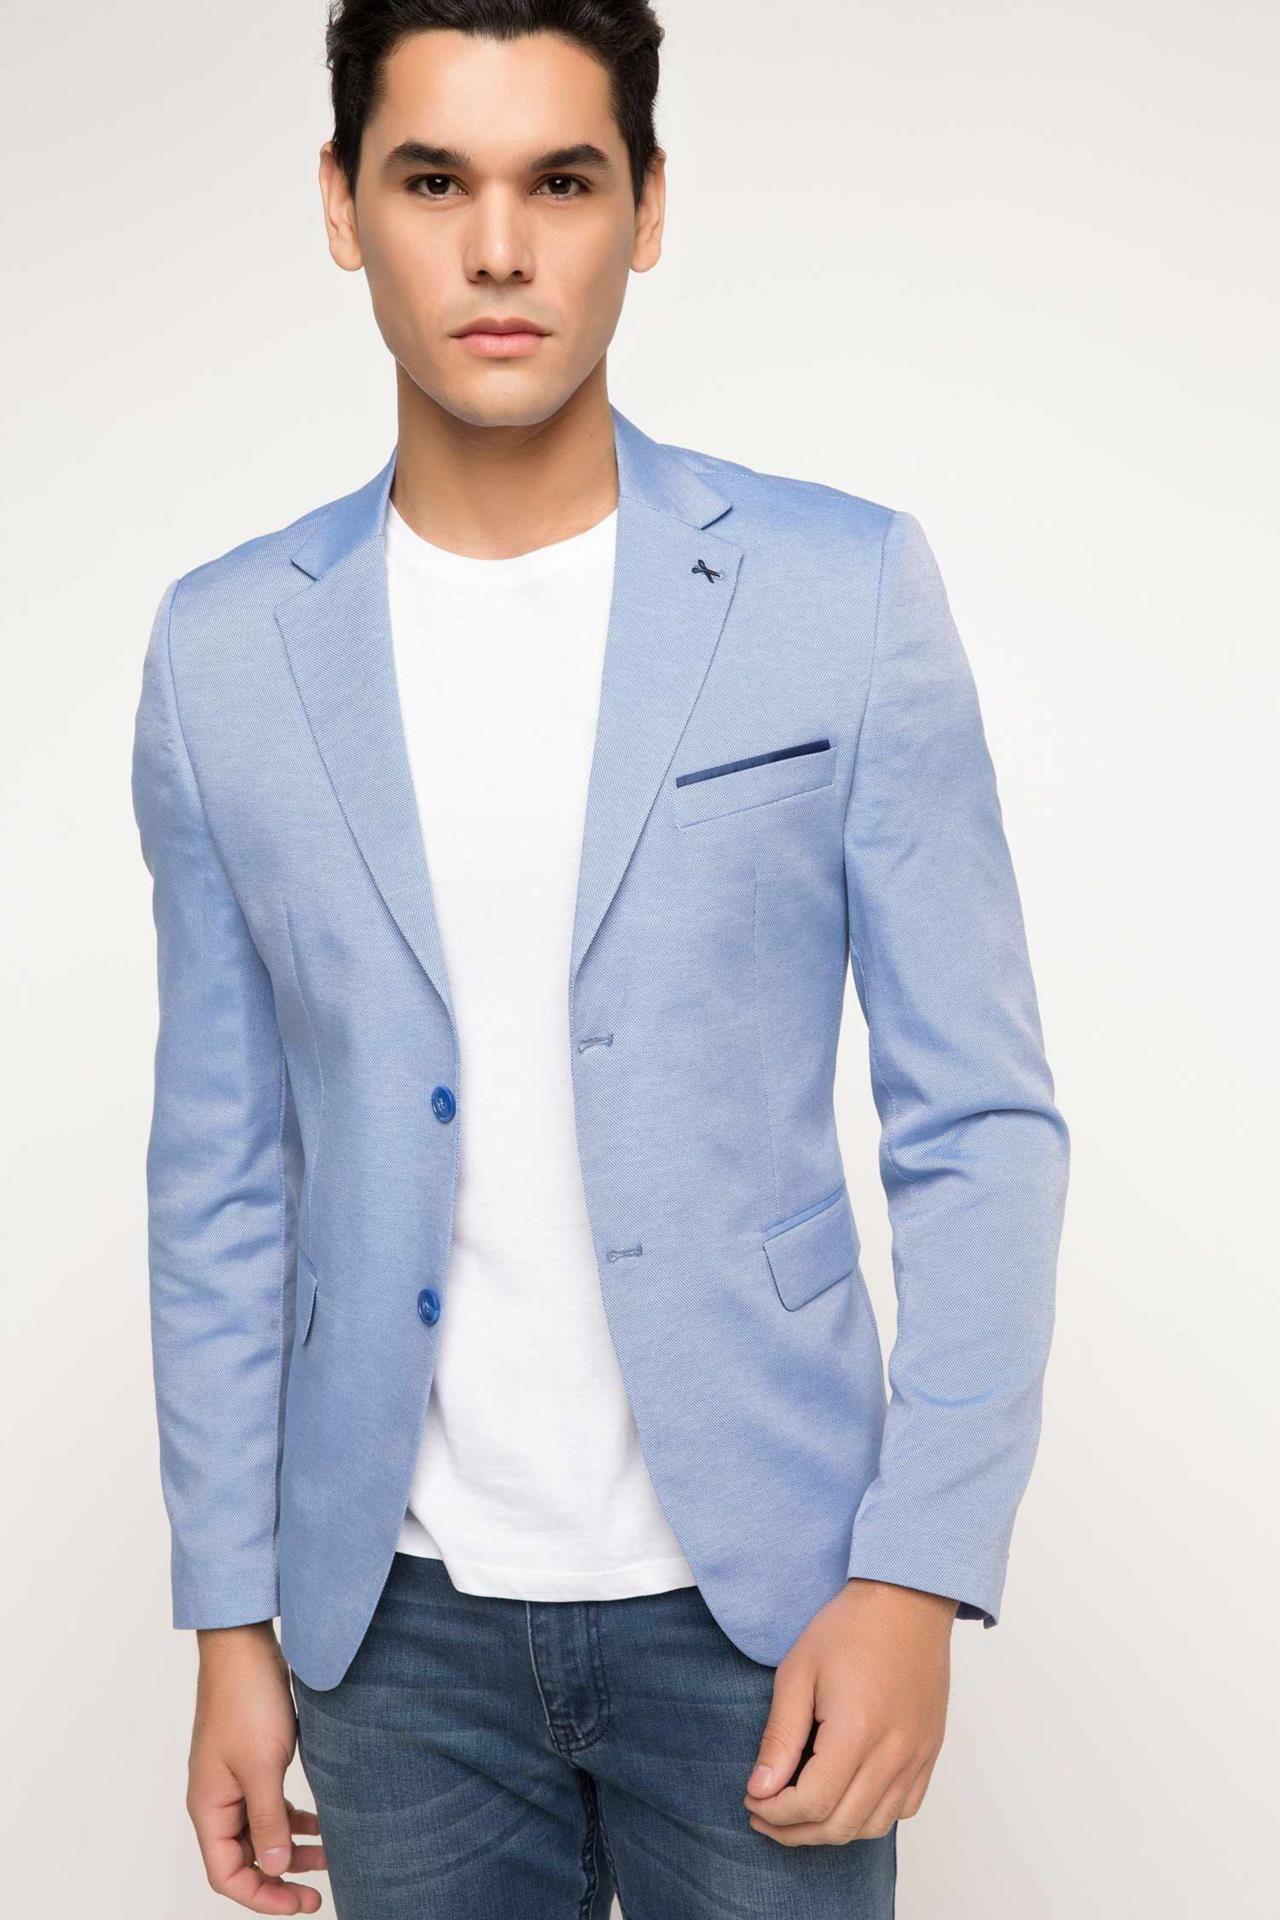 Defacto Marka Oxford Modern Fit Ceket Rahat Kesimi Ve Trend Detaylari Ile Kolayca Sik Ve Fit Gorunebileceginiz Defacto Erke Fashion Suit Jacket Men S Blazer